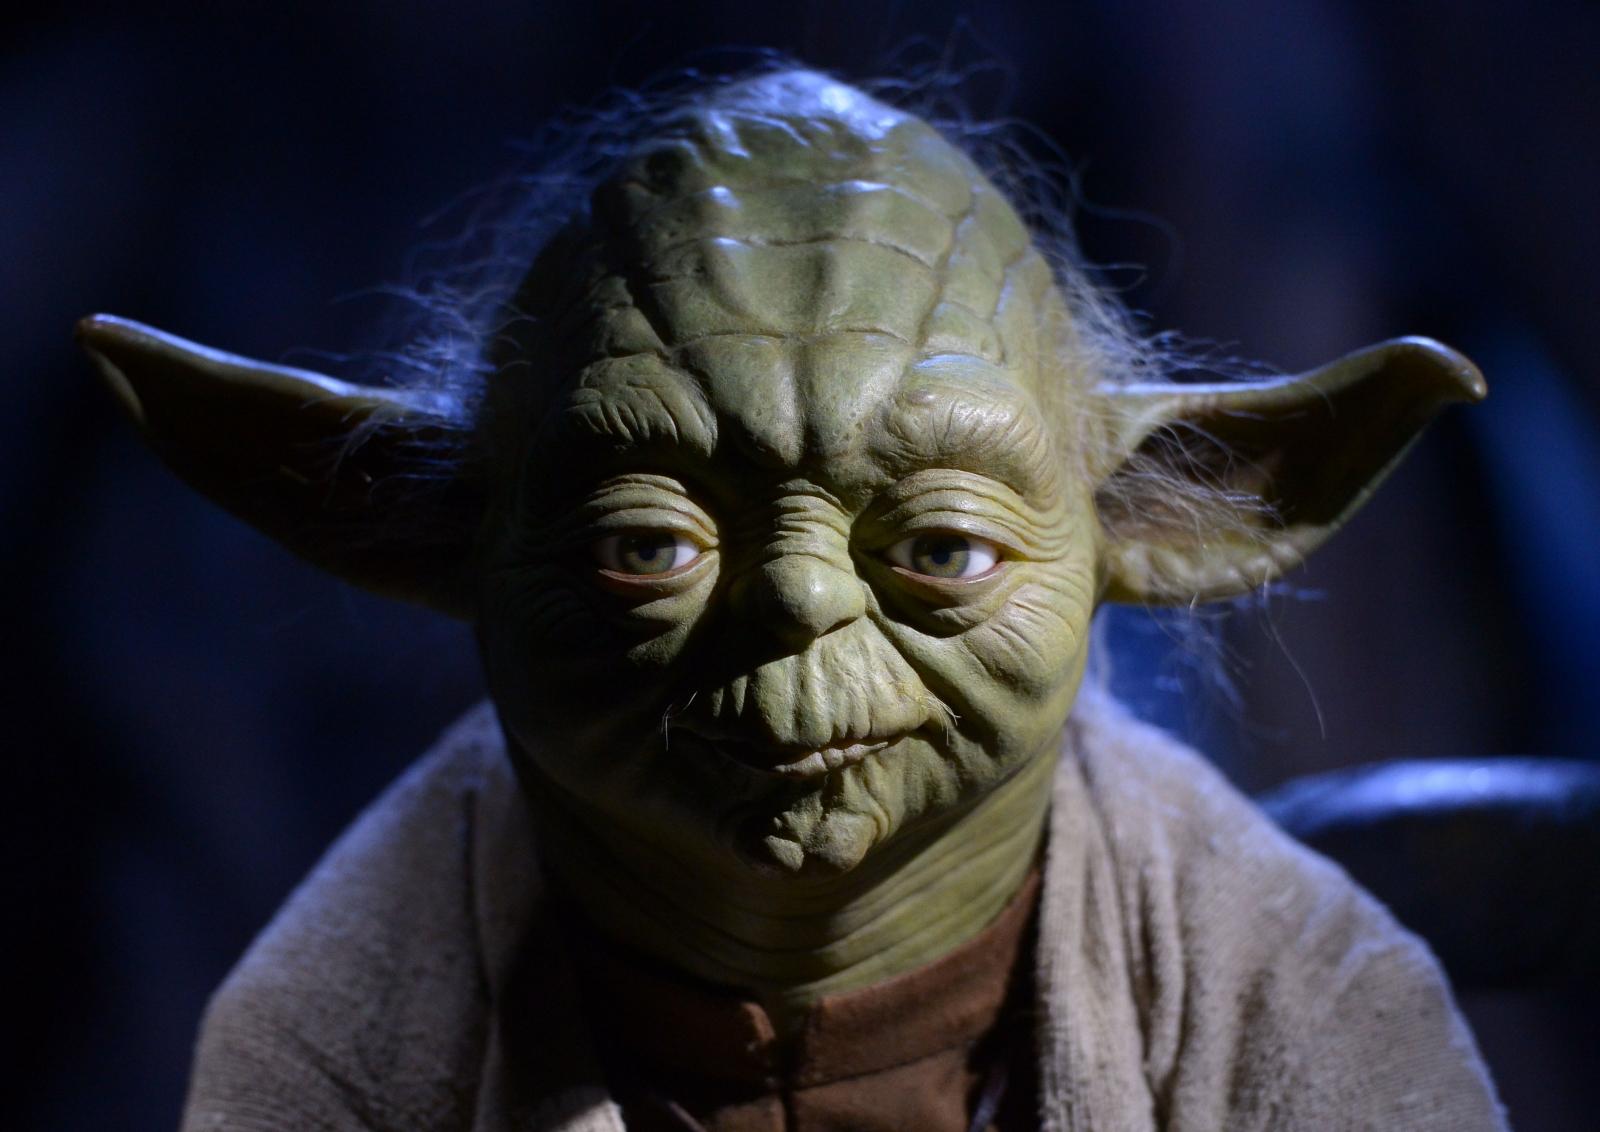 Model of Star Wars character Yoda